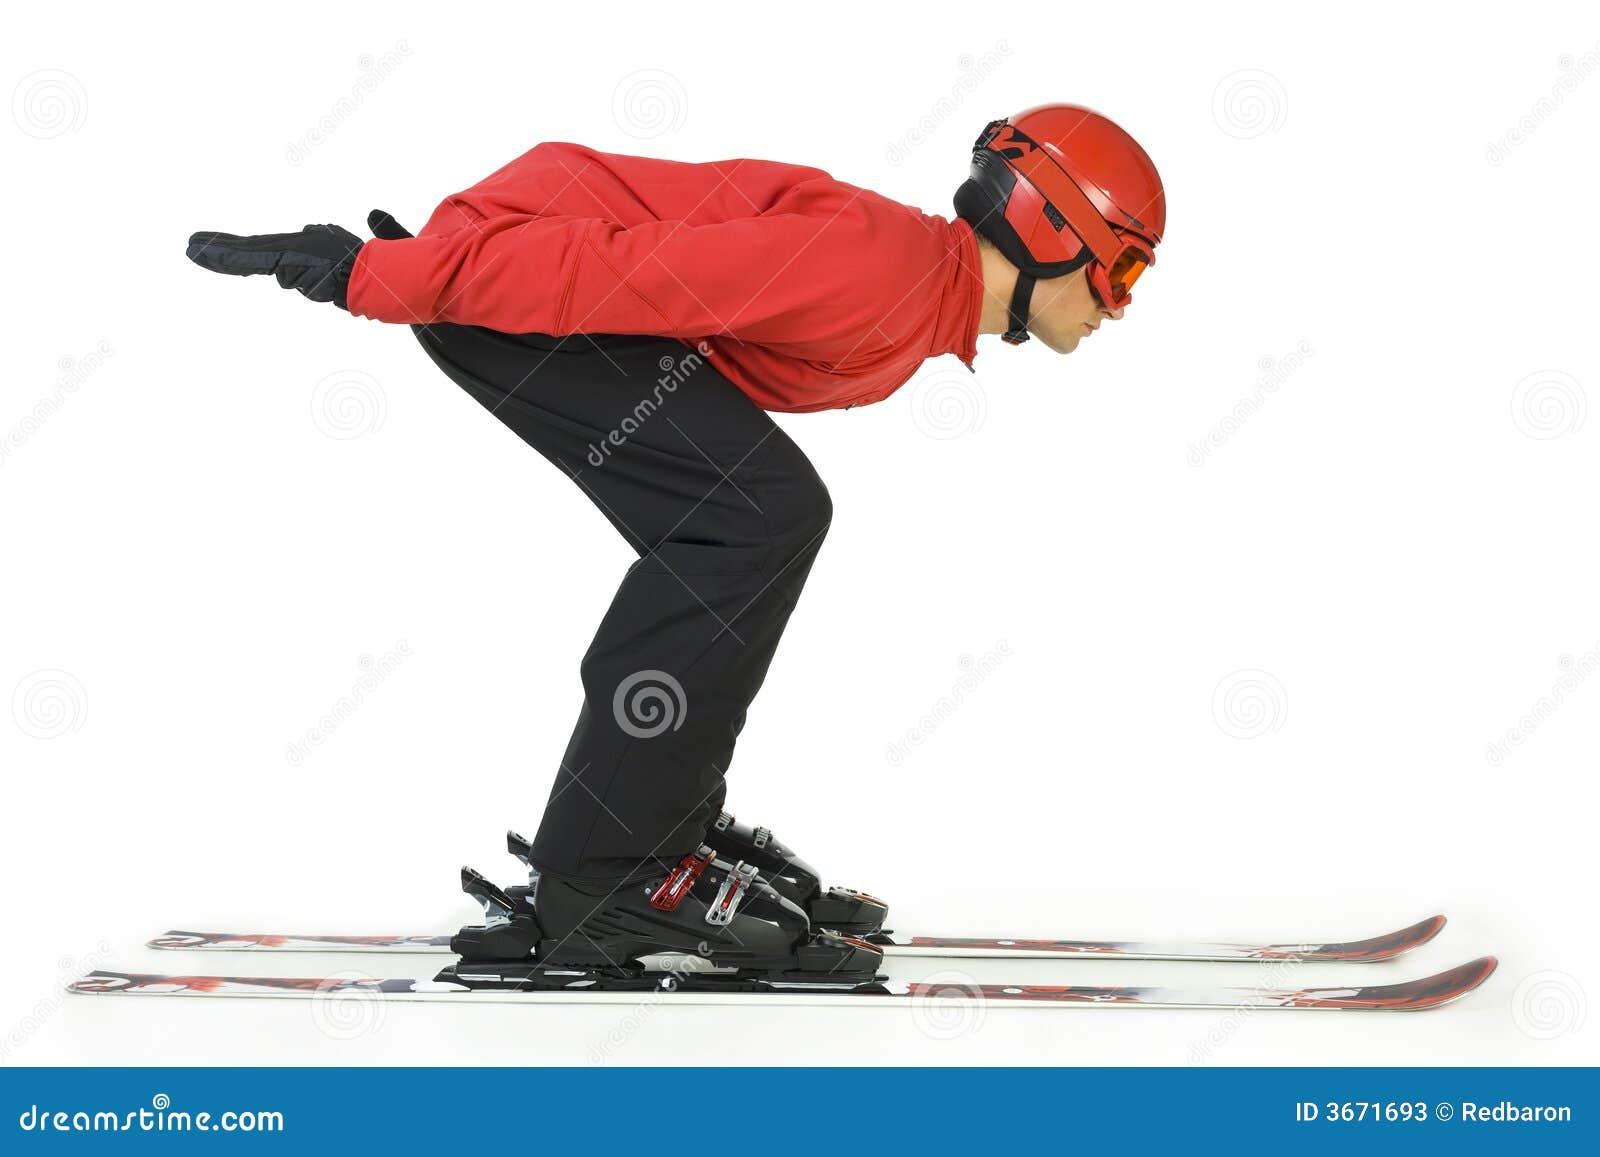 Ski jumper begins his jump